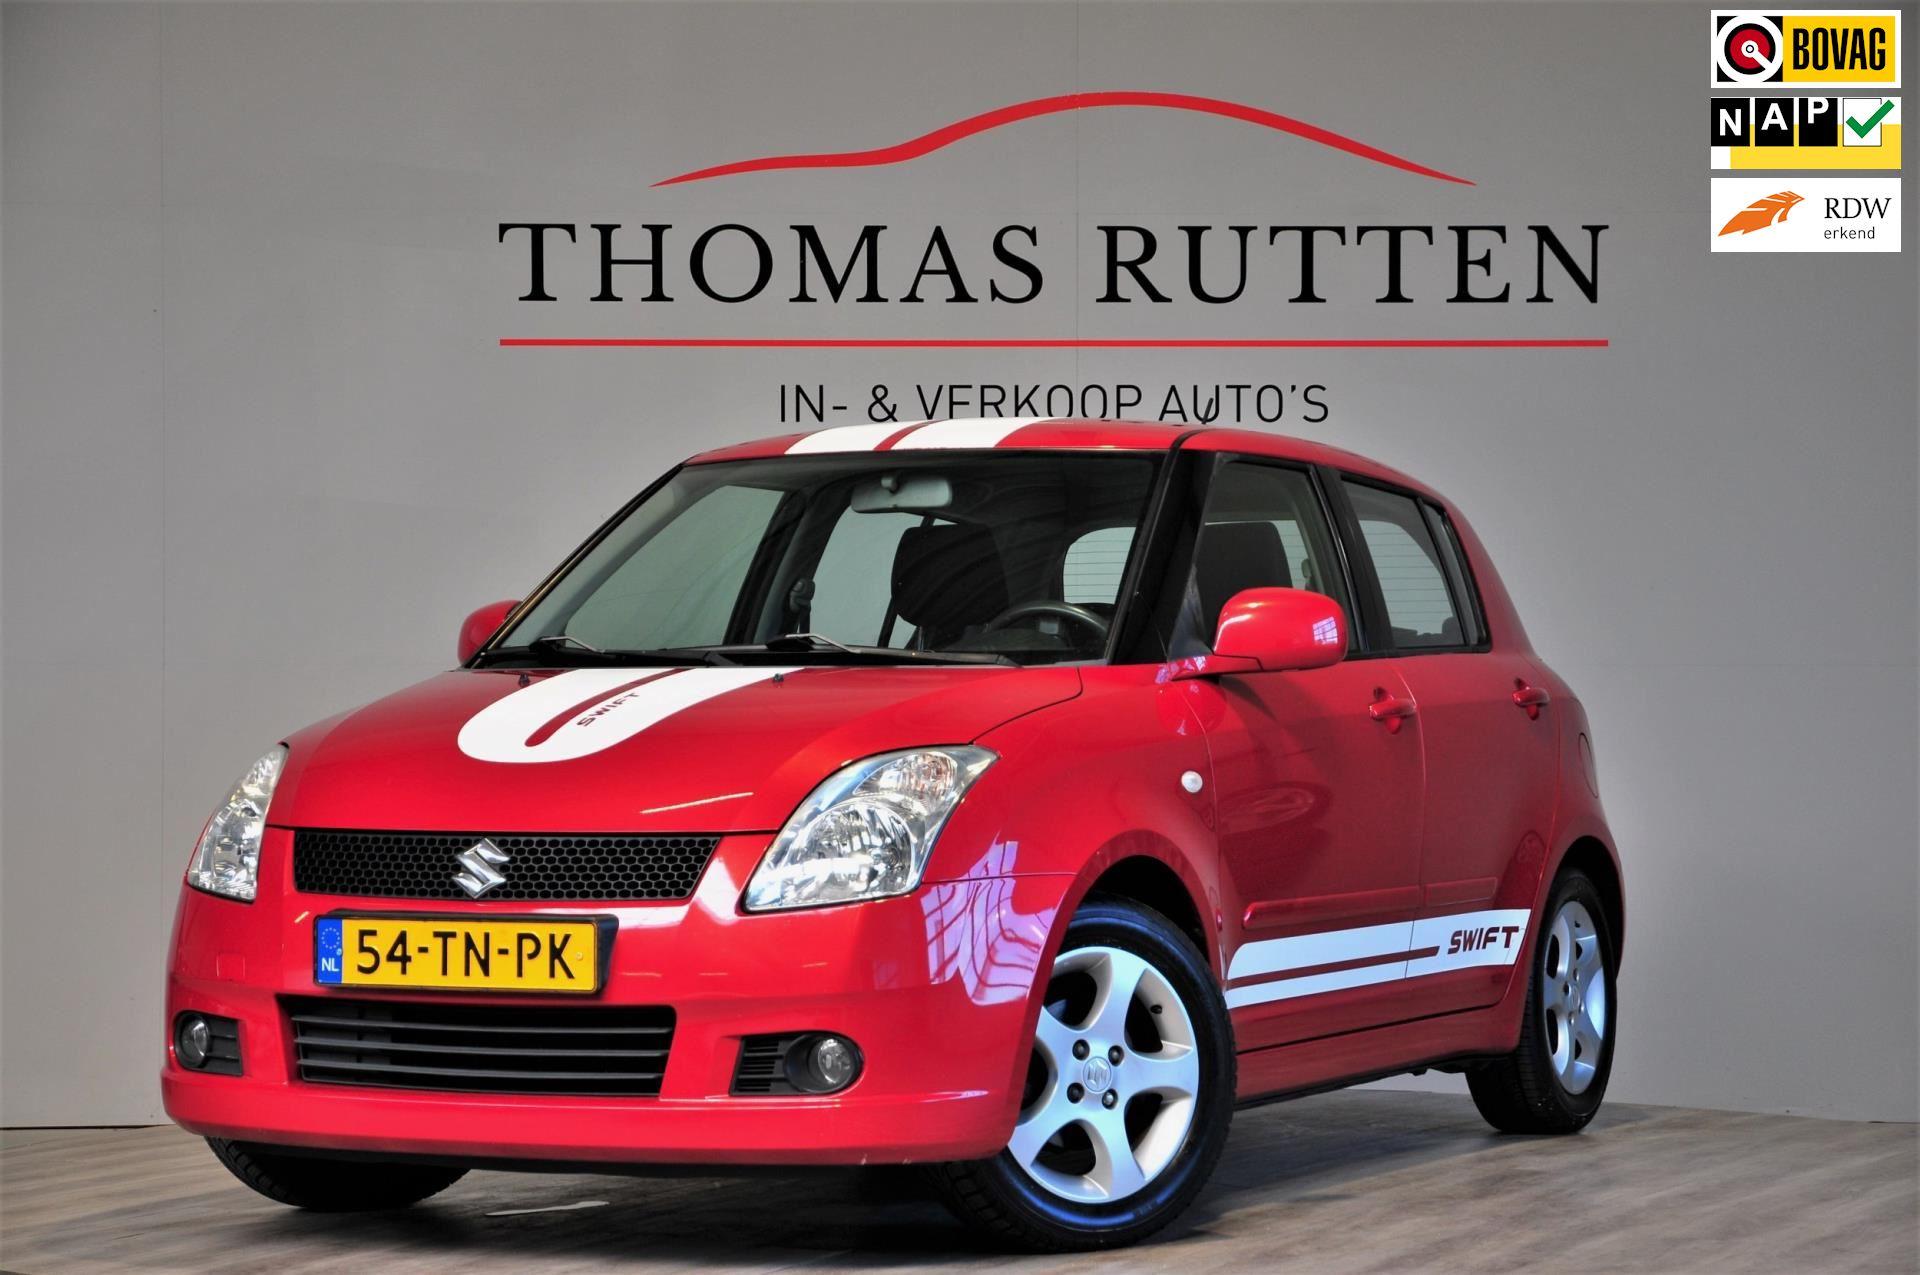 Suzuki Swift occasion - Autobedrijf Thomas Rutten